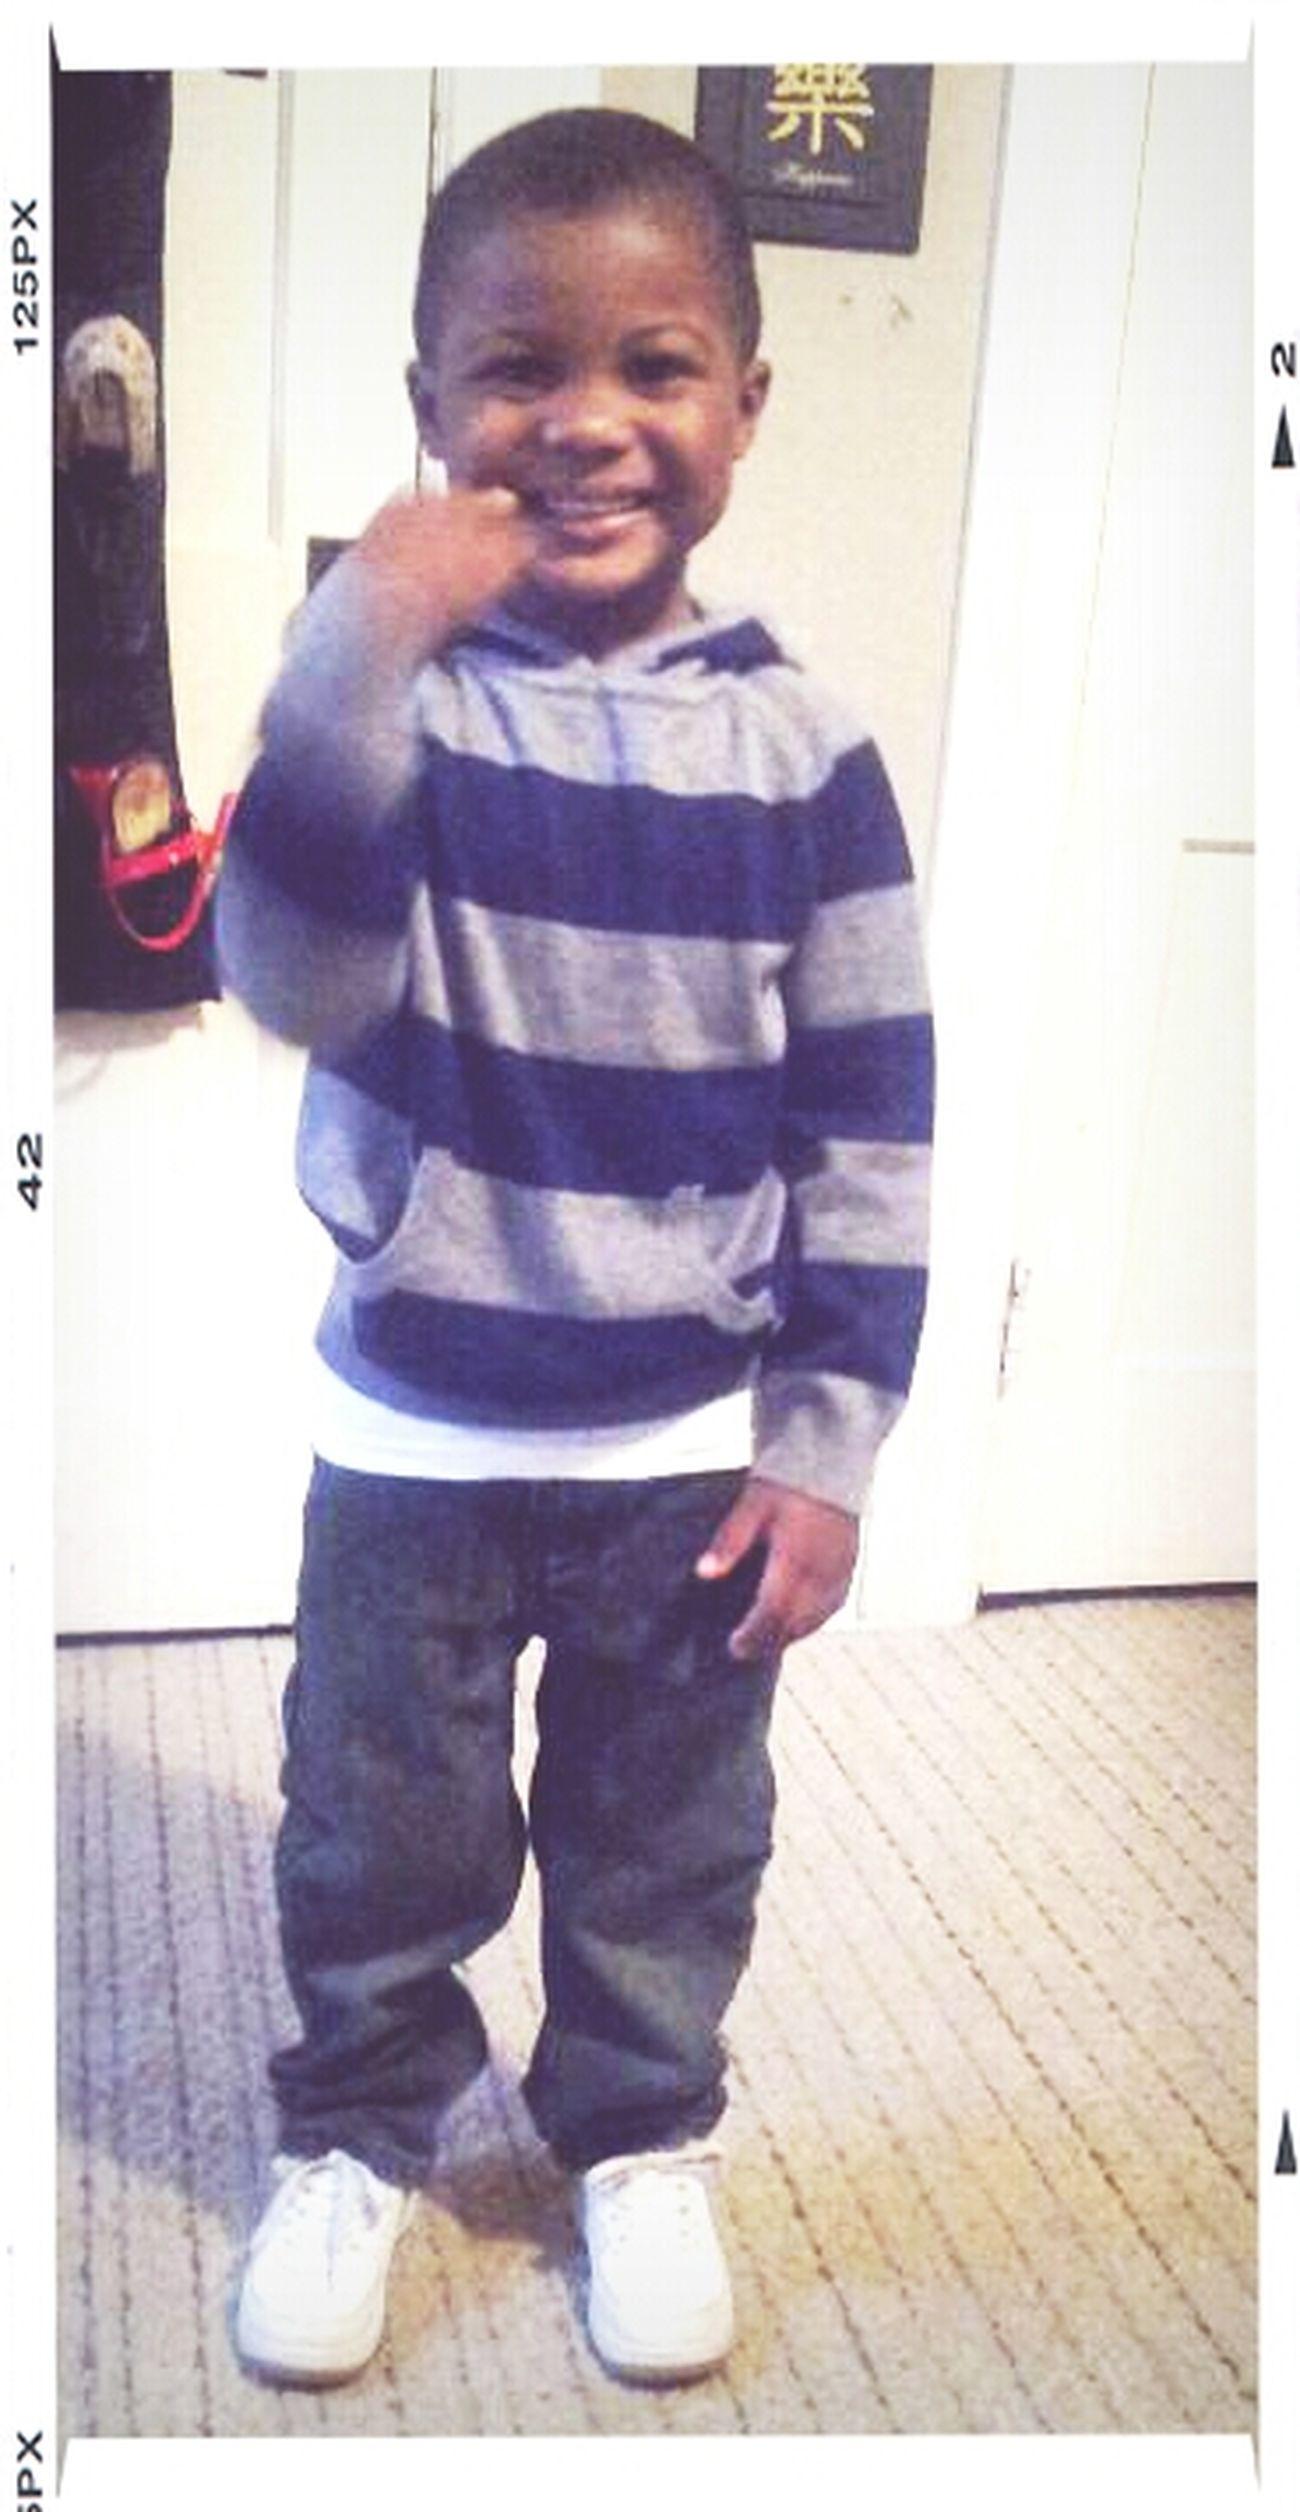 #babyboy #son #